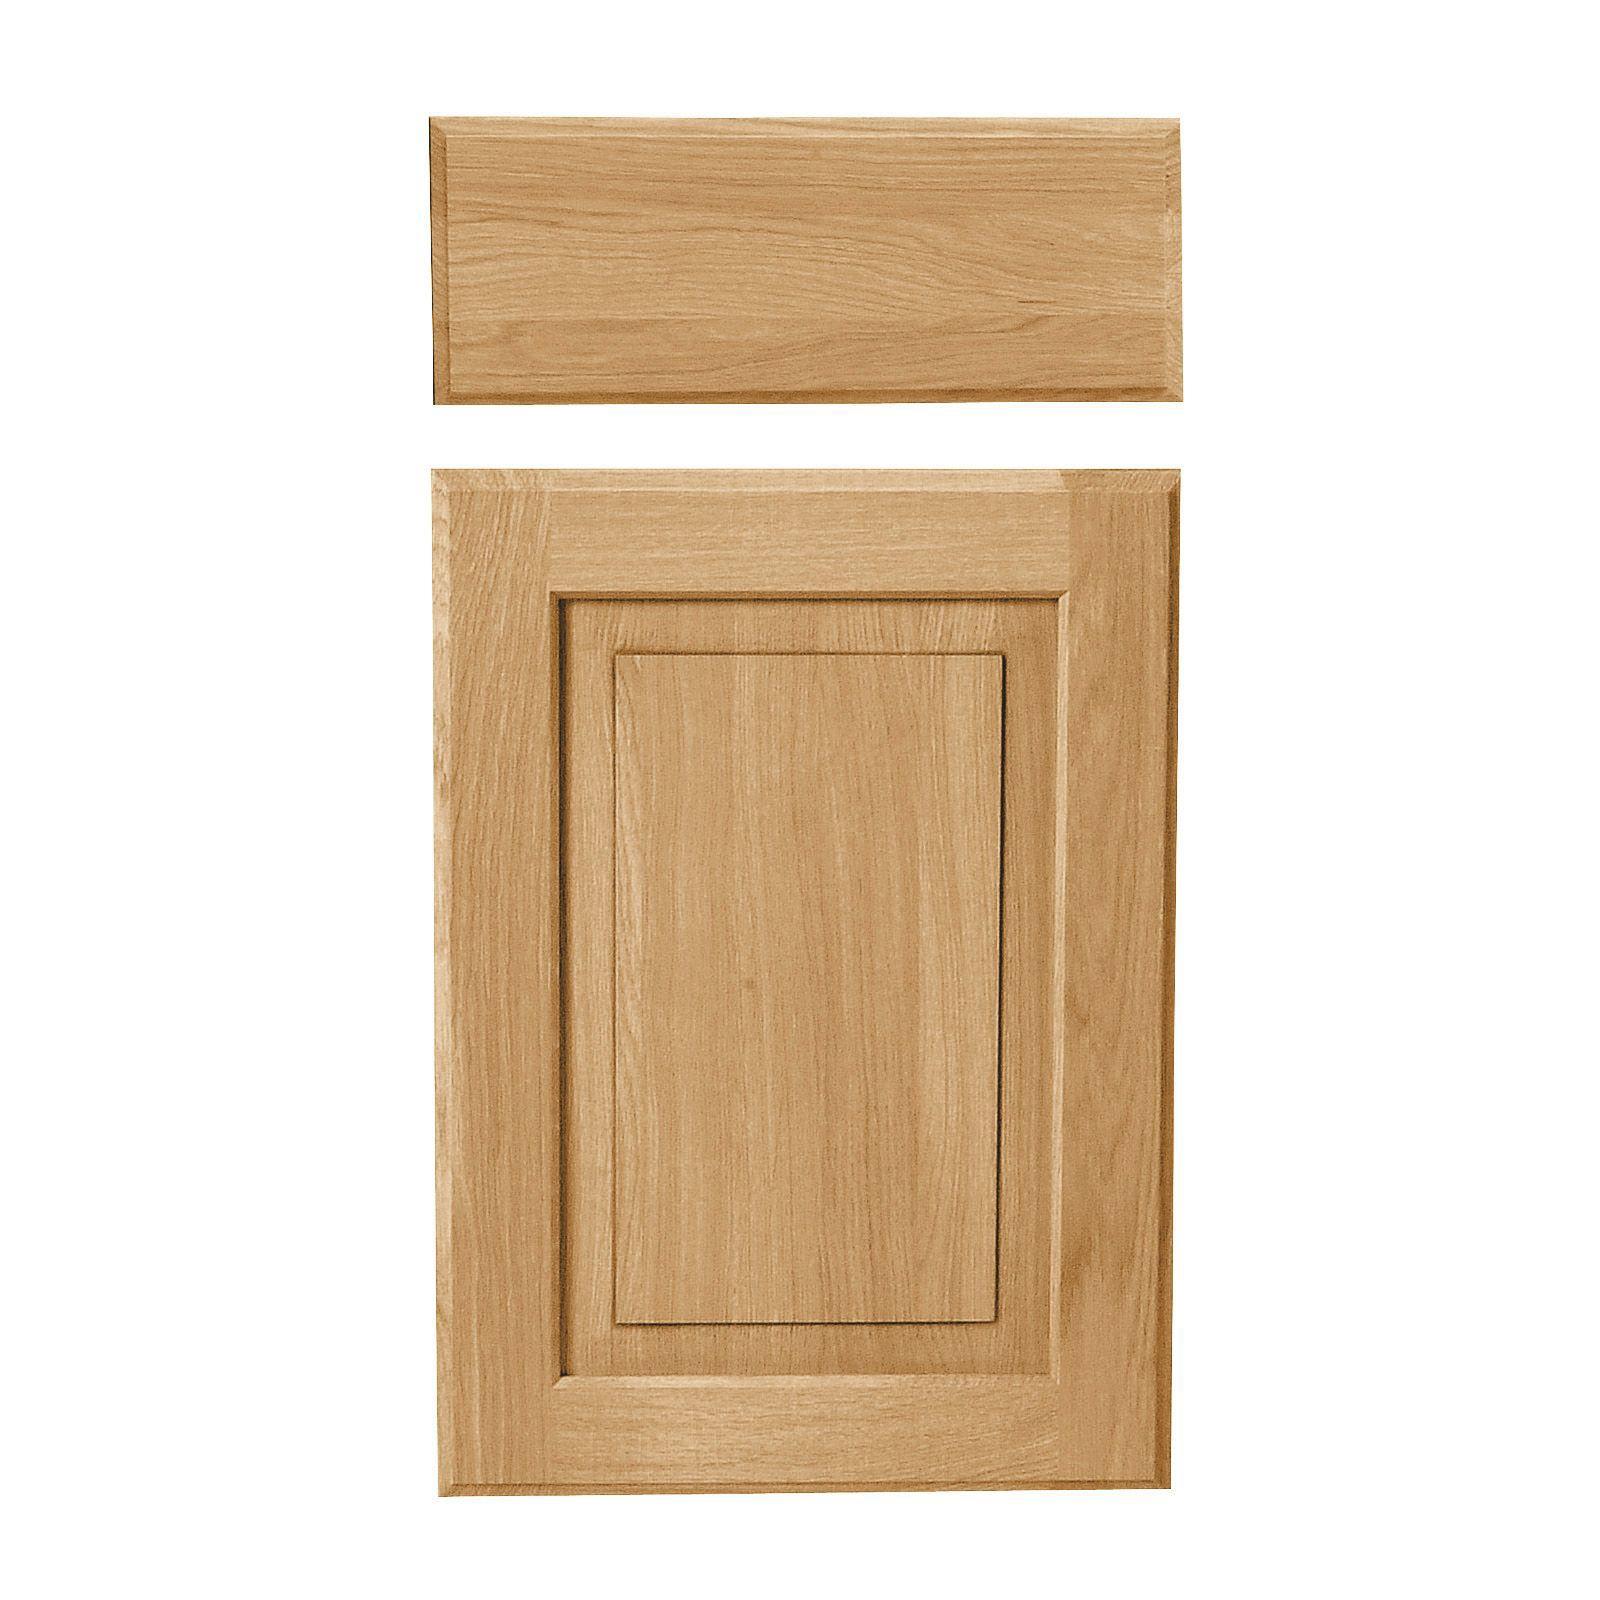 B Q Kitchen Cabinets Sale: Cooke & Lewis Chesterton Solid Oak Classic Drawerline Door